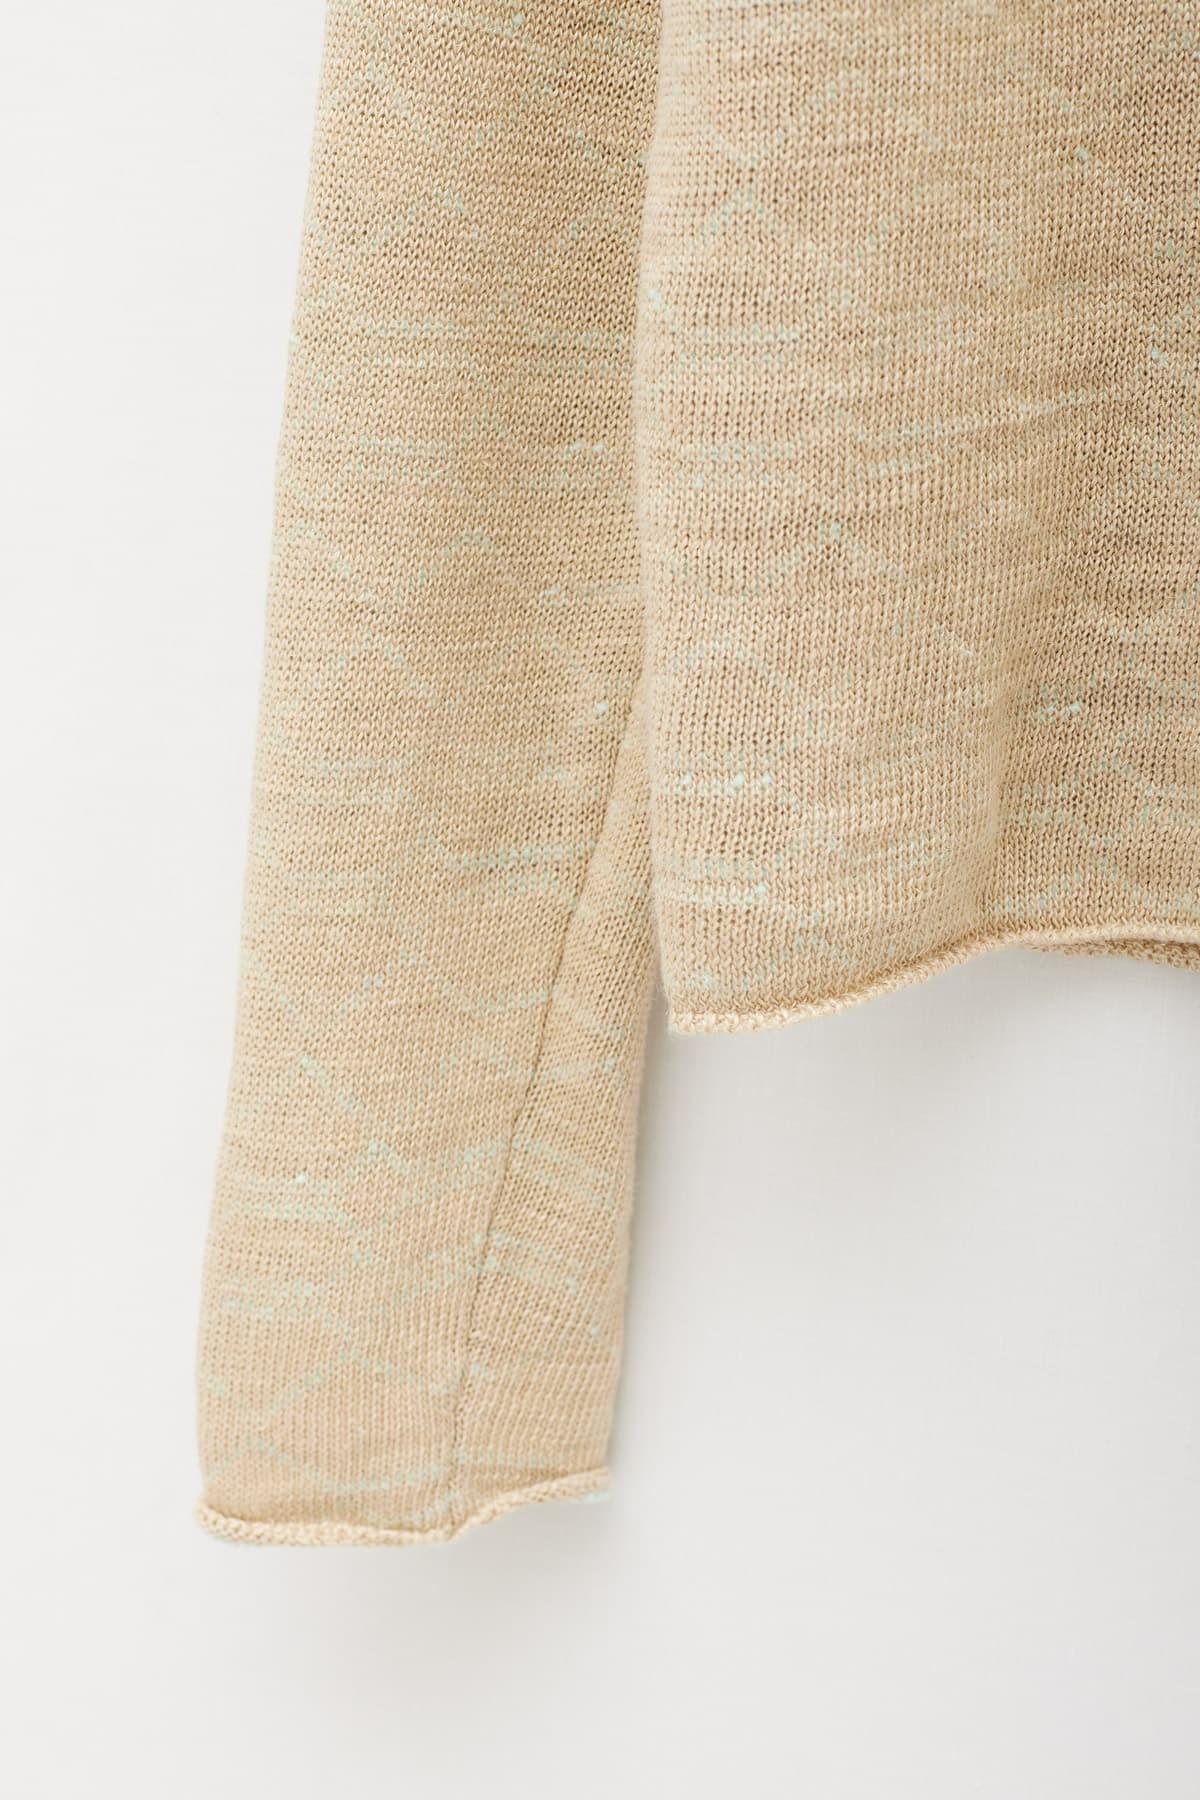 Shop Acne Studios Dark Green Simon Floral Patch Shirt